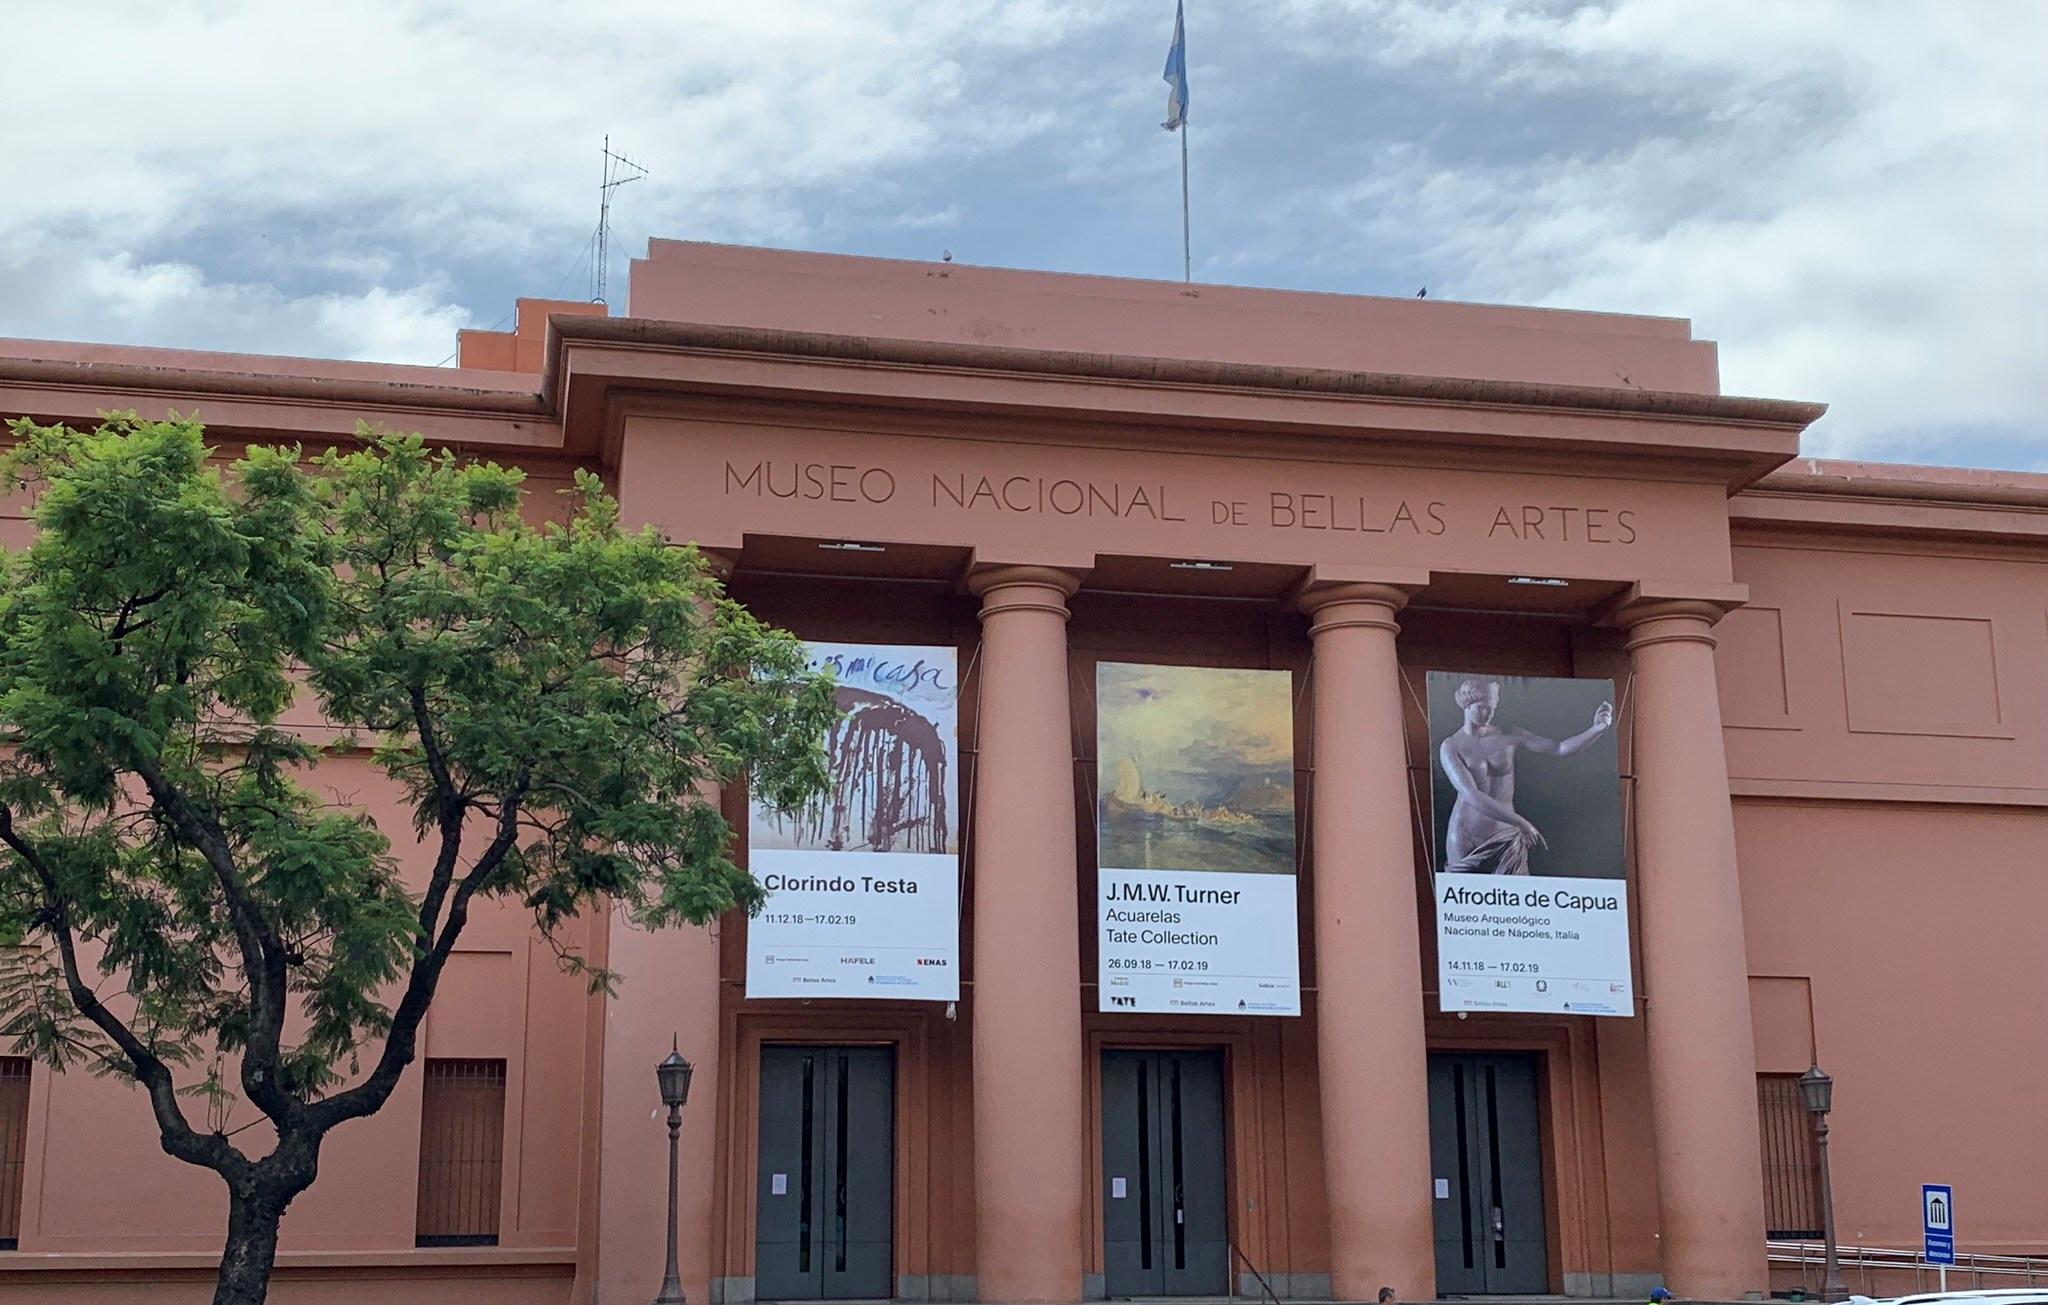 Museu de Belas Artes - Recoleta - Buenos Aires